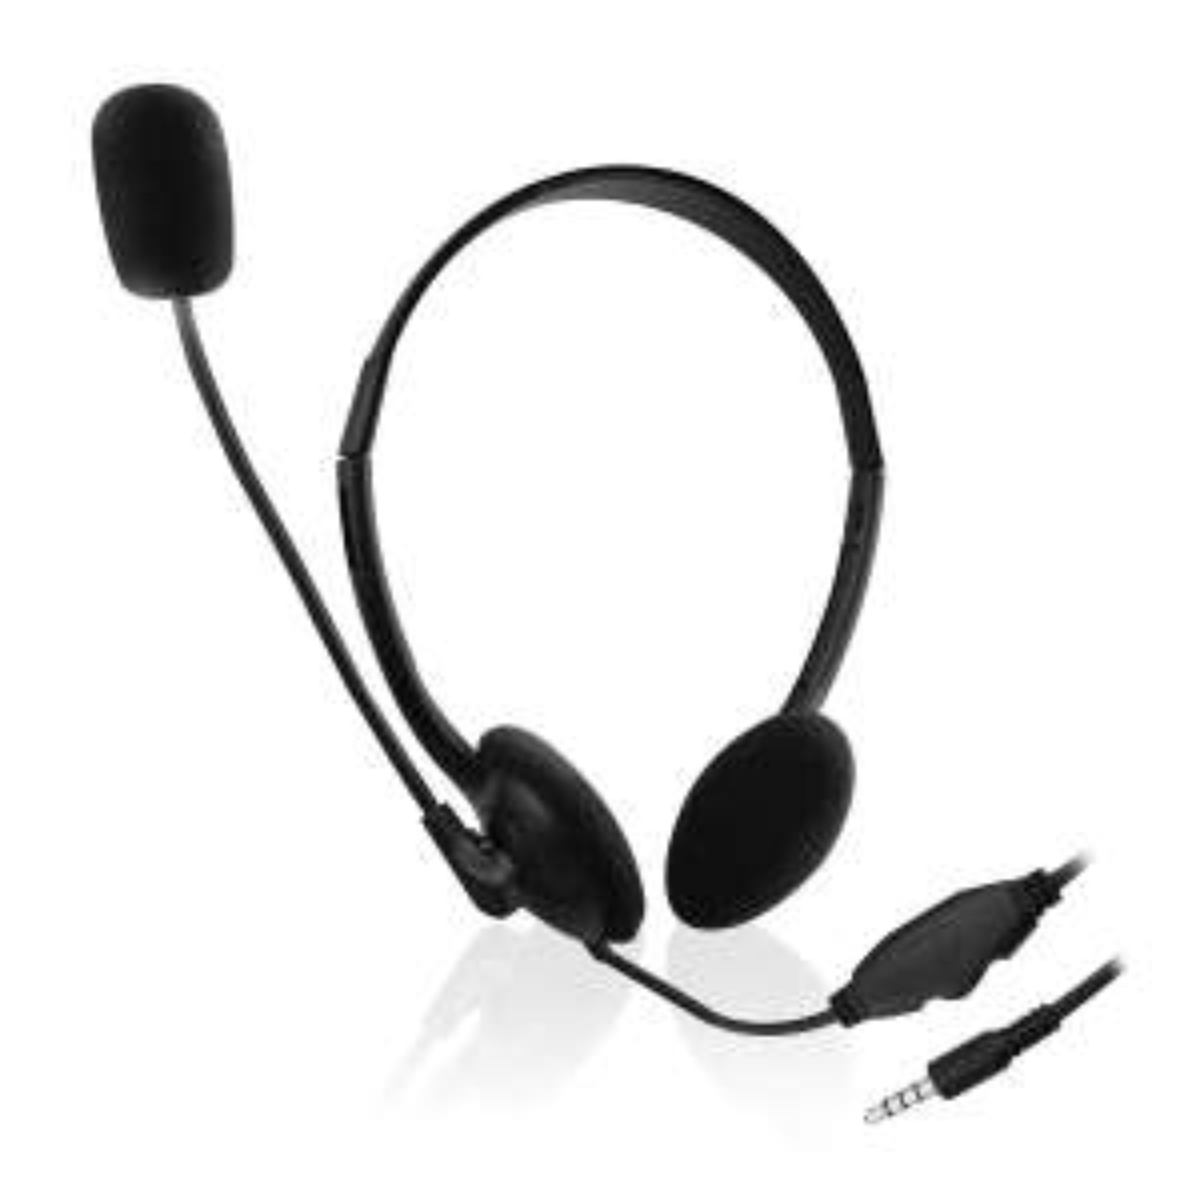 Ewent EW3567 Headset Black @ Amazon Warehouse Used Very Good £2.38 Prime £6.87 Non Prime (20% Reduction @ Checkout)